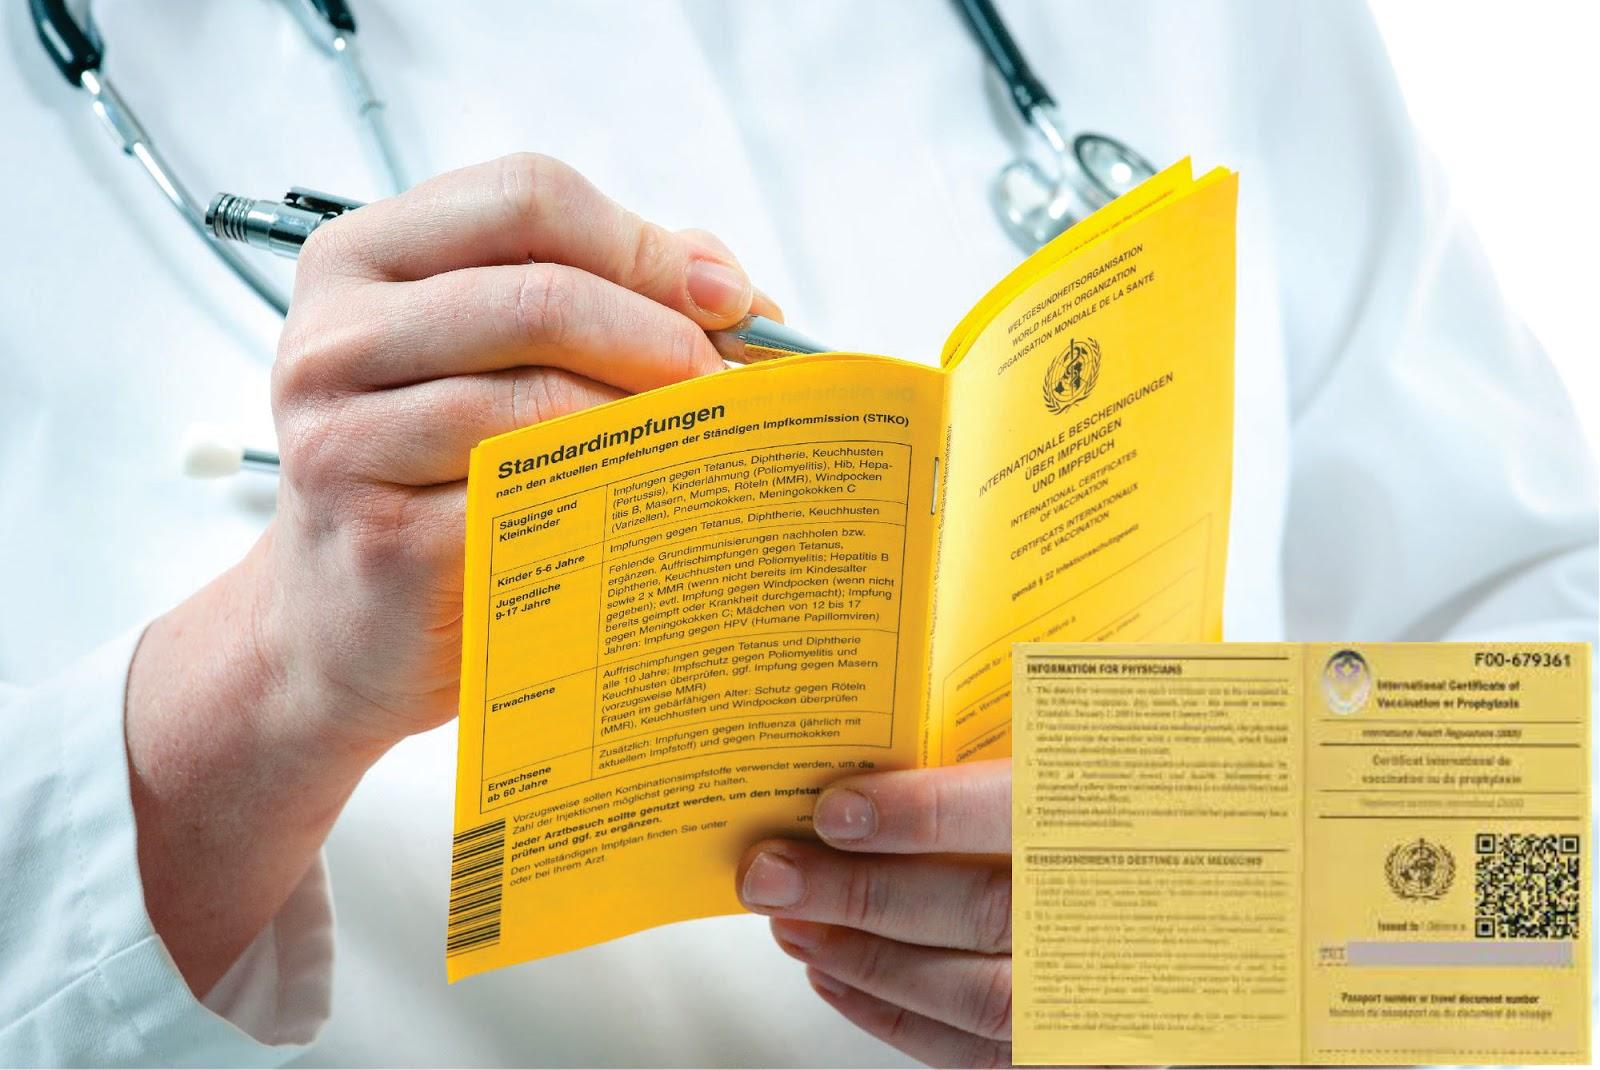 Cara Cek Online Keaslian Sertifikat Vaksin Meningitis ...